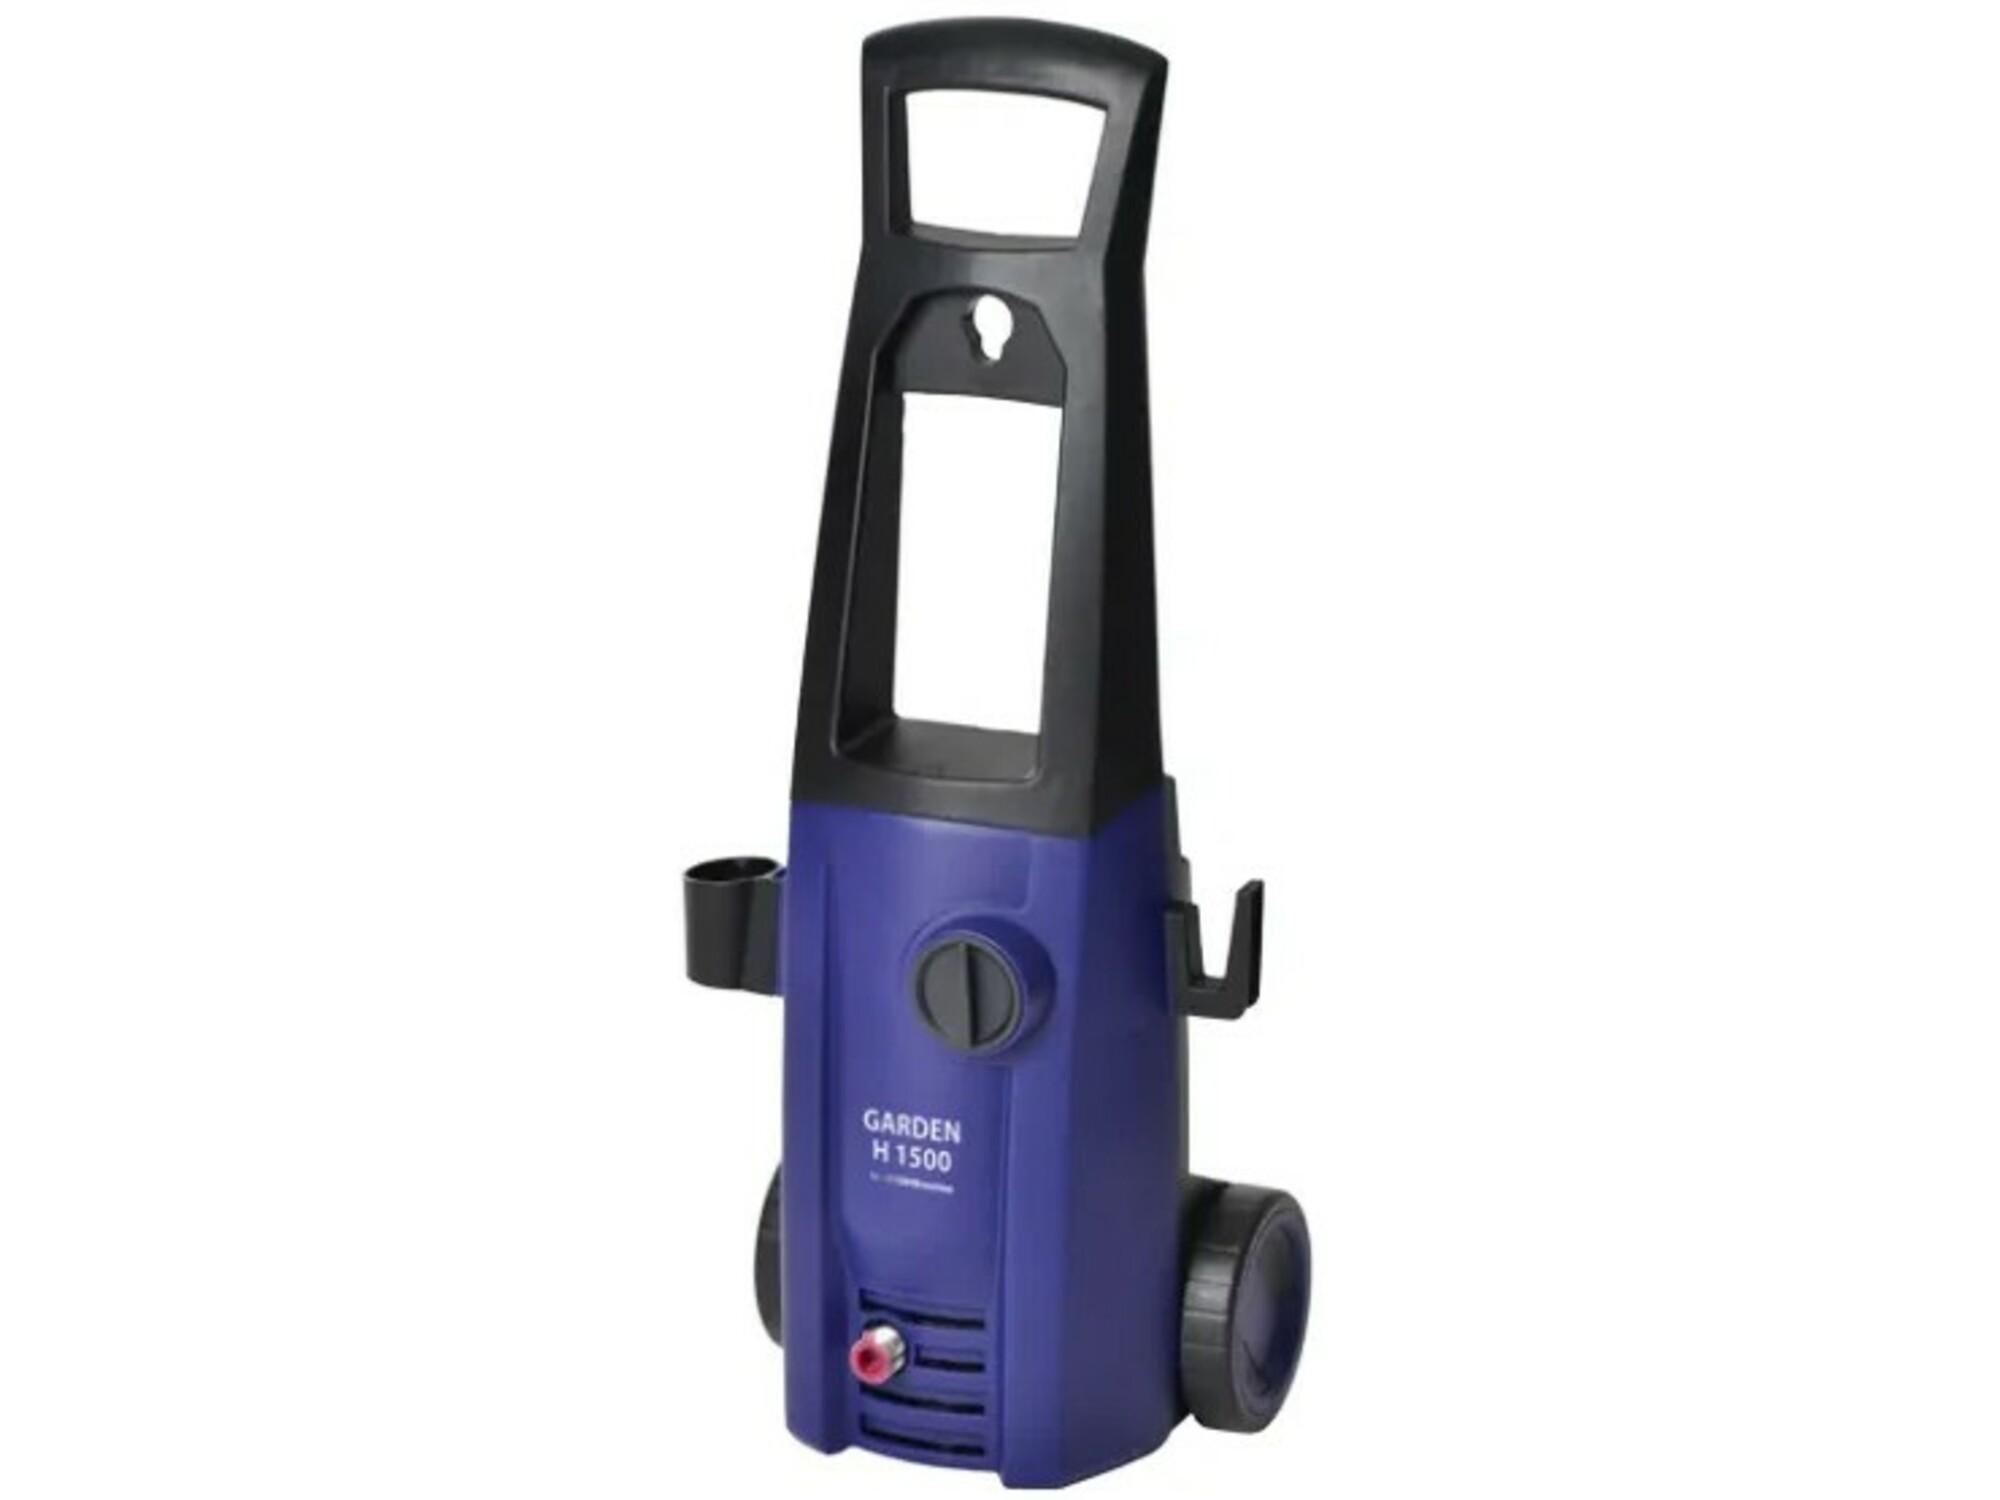 REM POWER visokotlačni čistilnik GARDEN H 1500